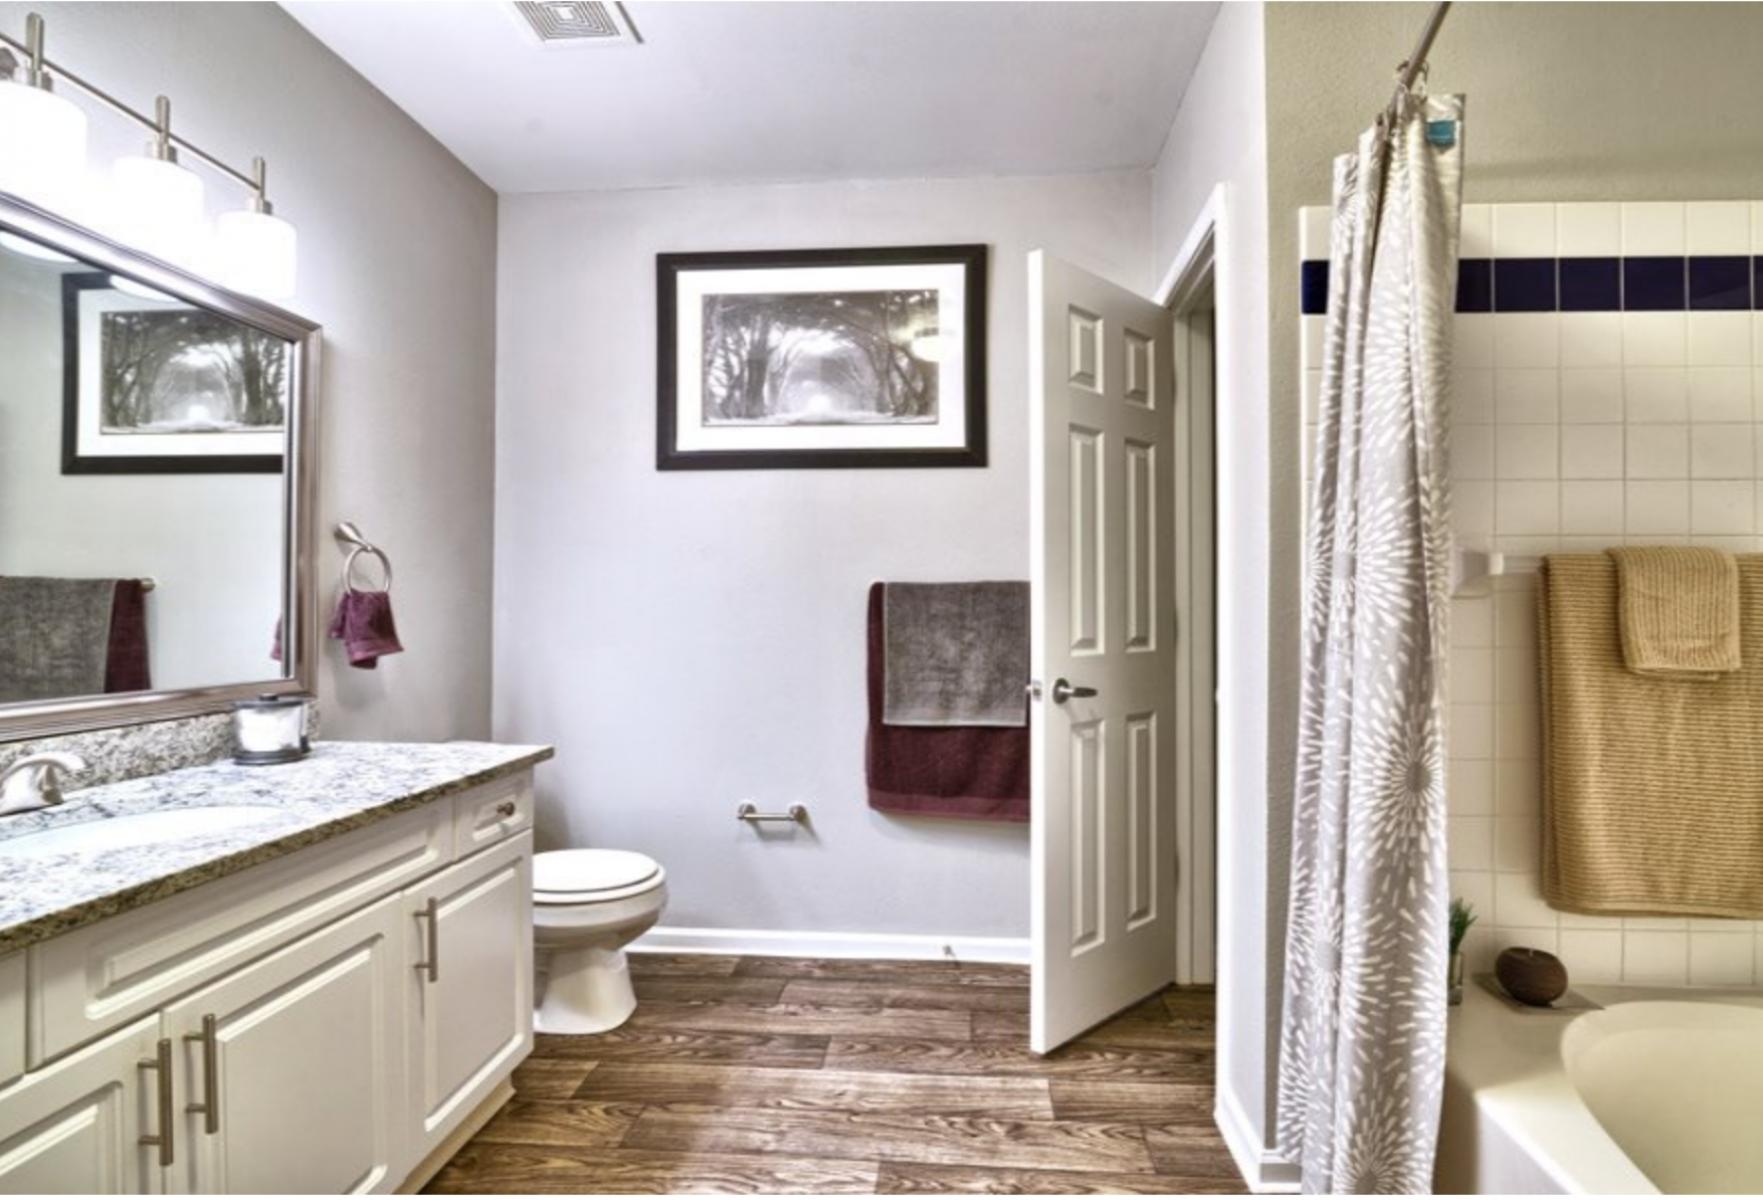 21 - Typical bathroom - Remodeled